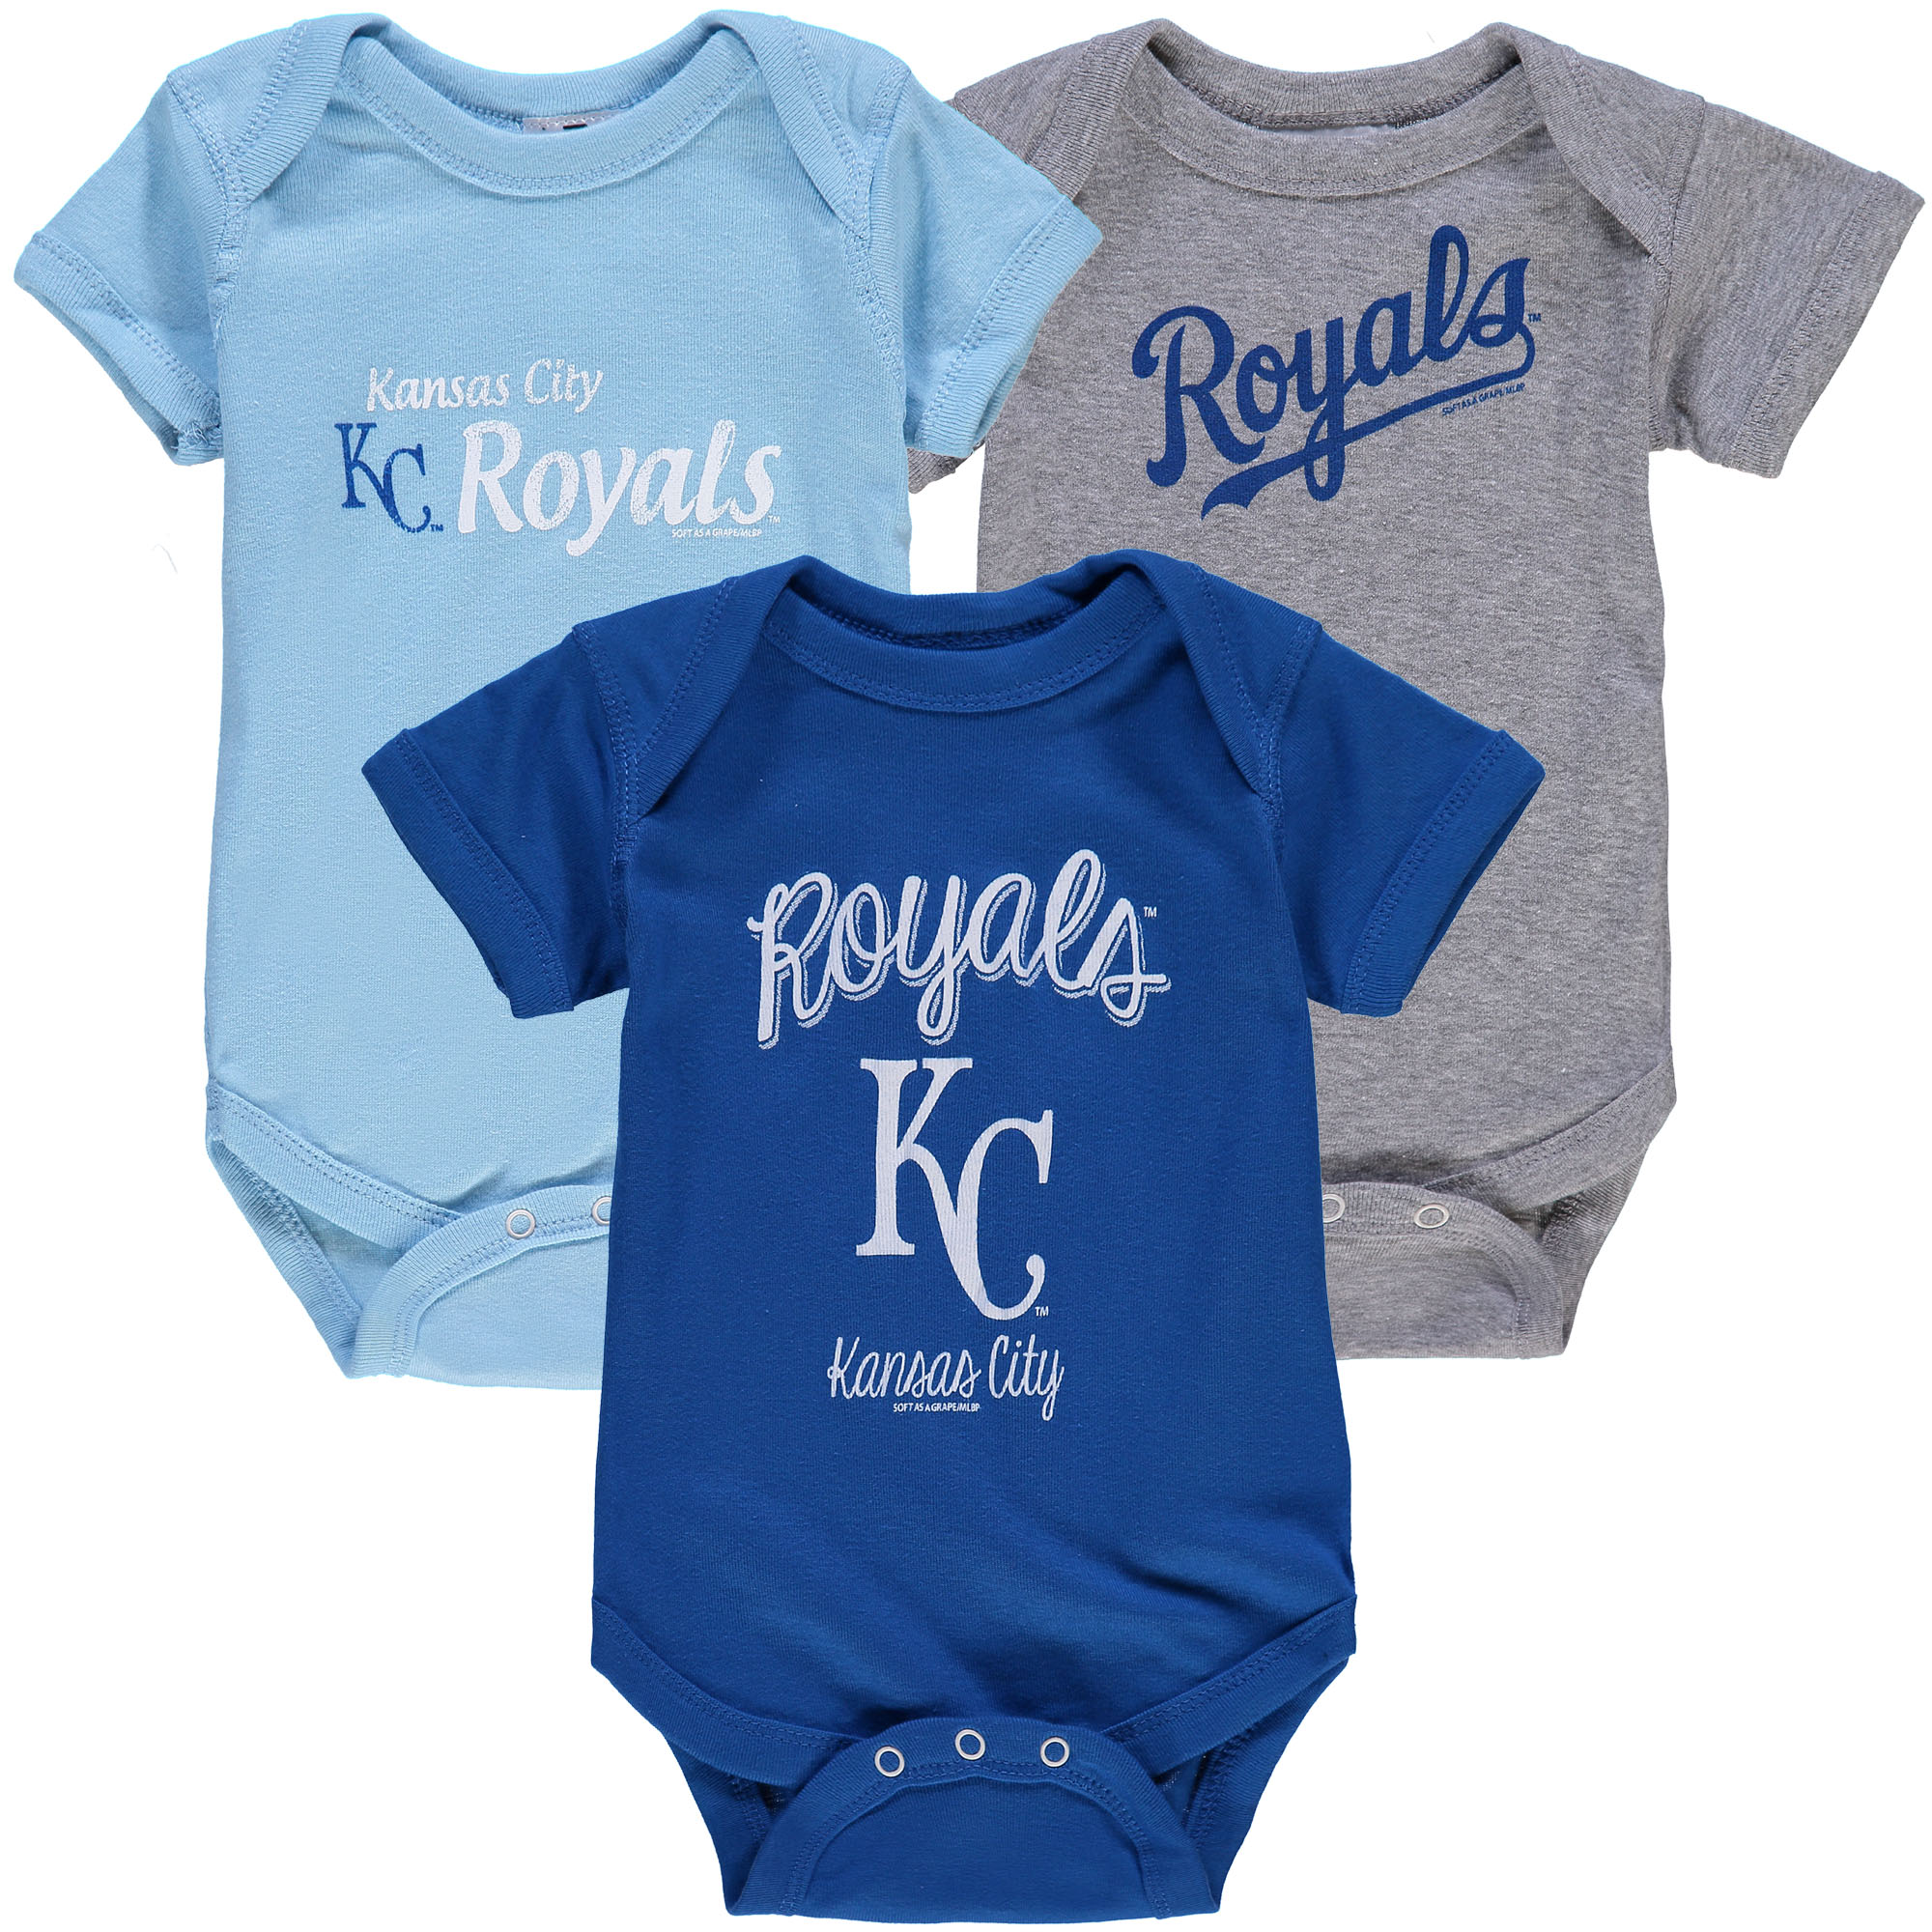 Kansas City Royals Soft as a Grape Infant 3-Pack Rookie Bodysuit Set - Royal/Light Blue/Gray